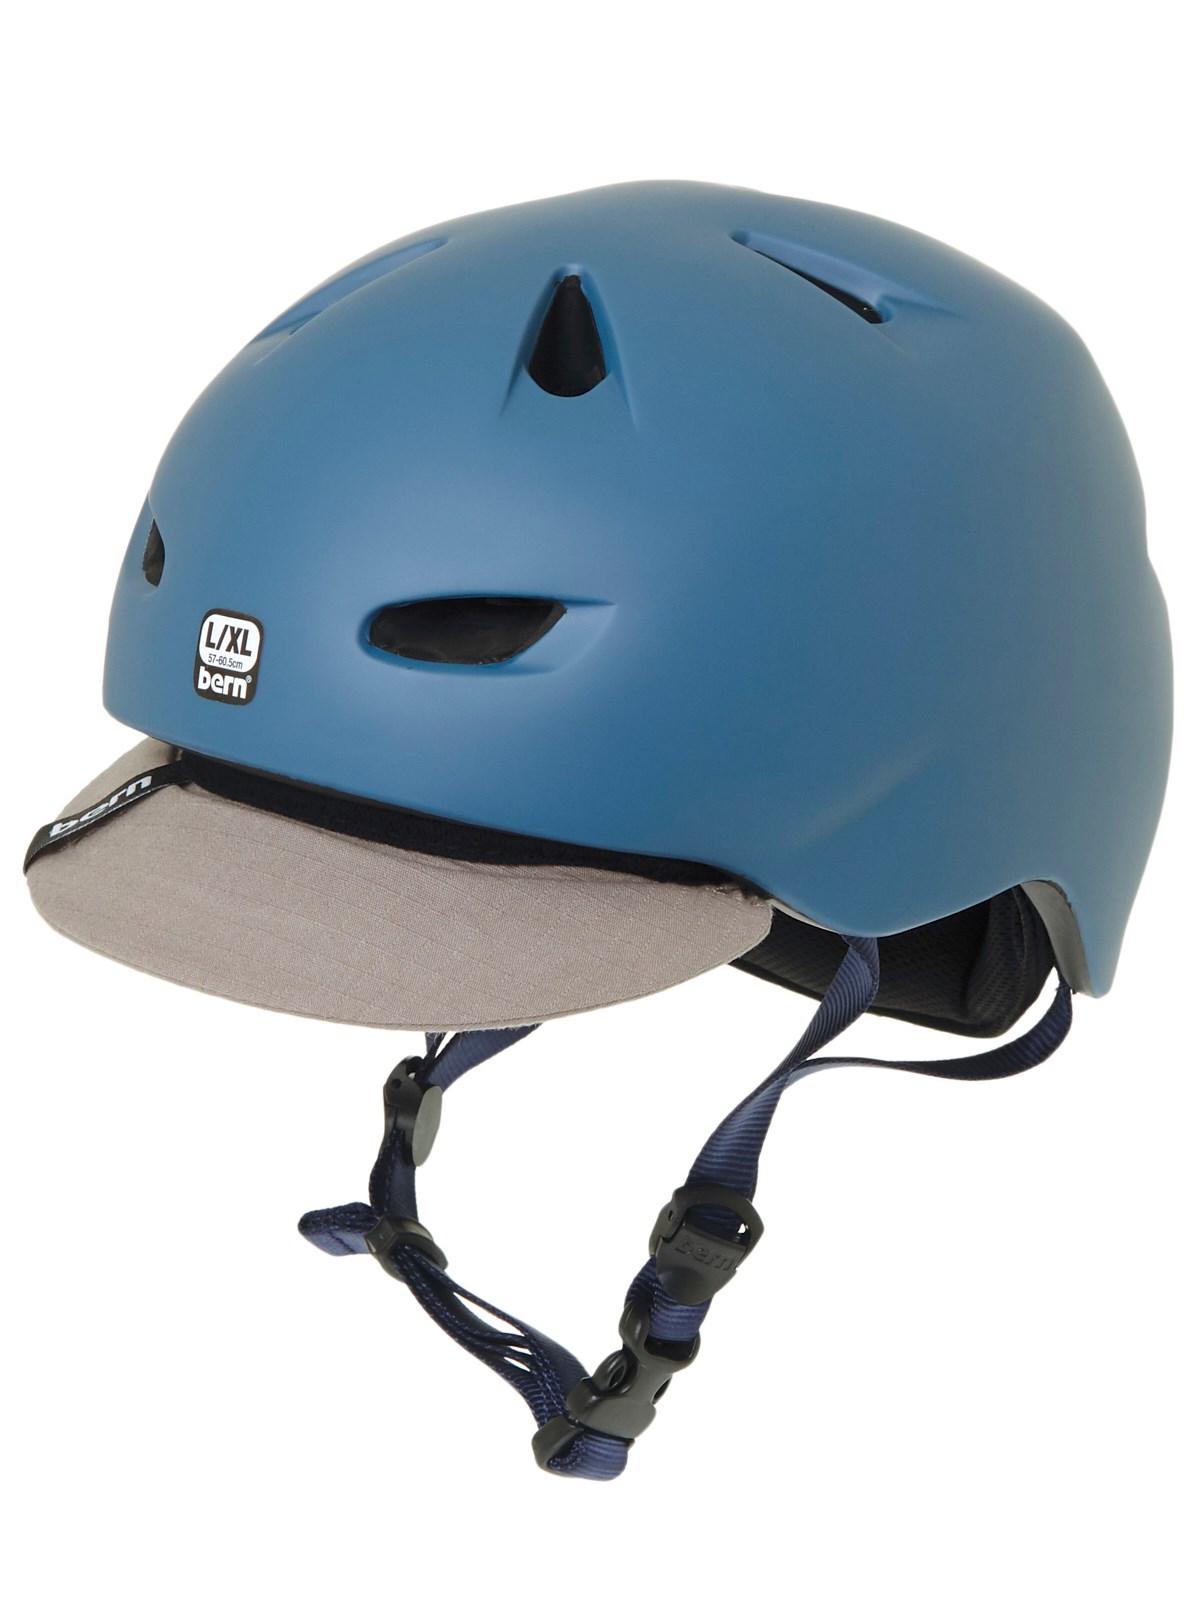 Bern casque vélo